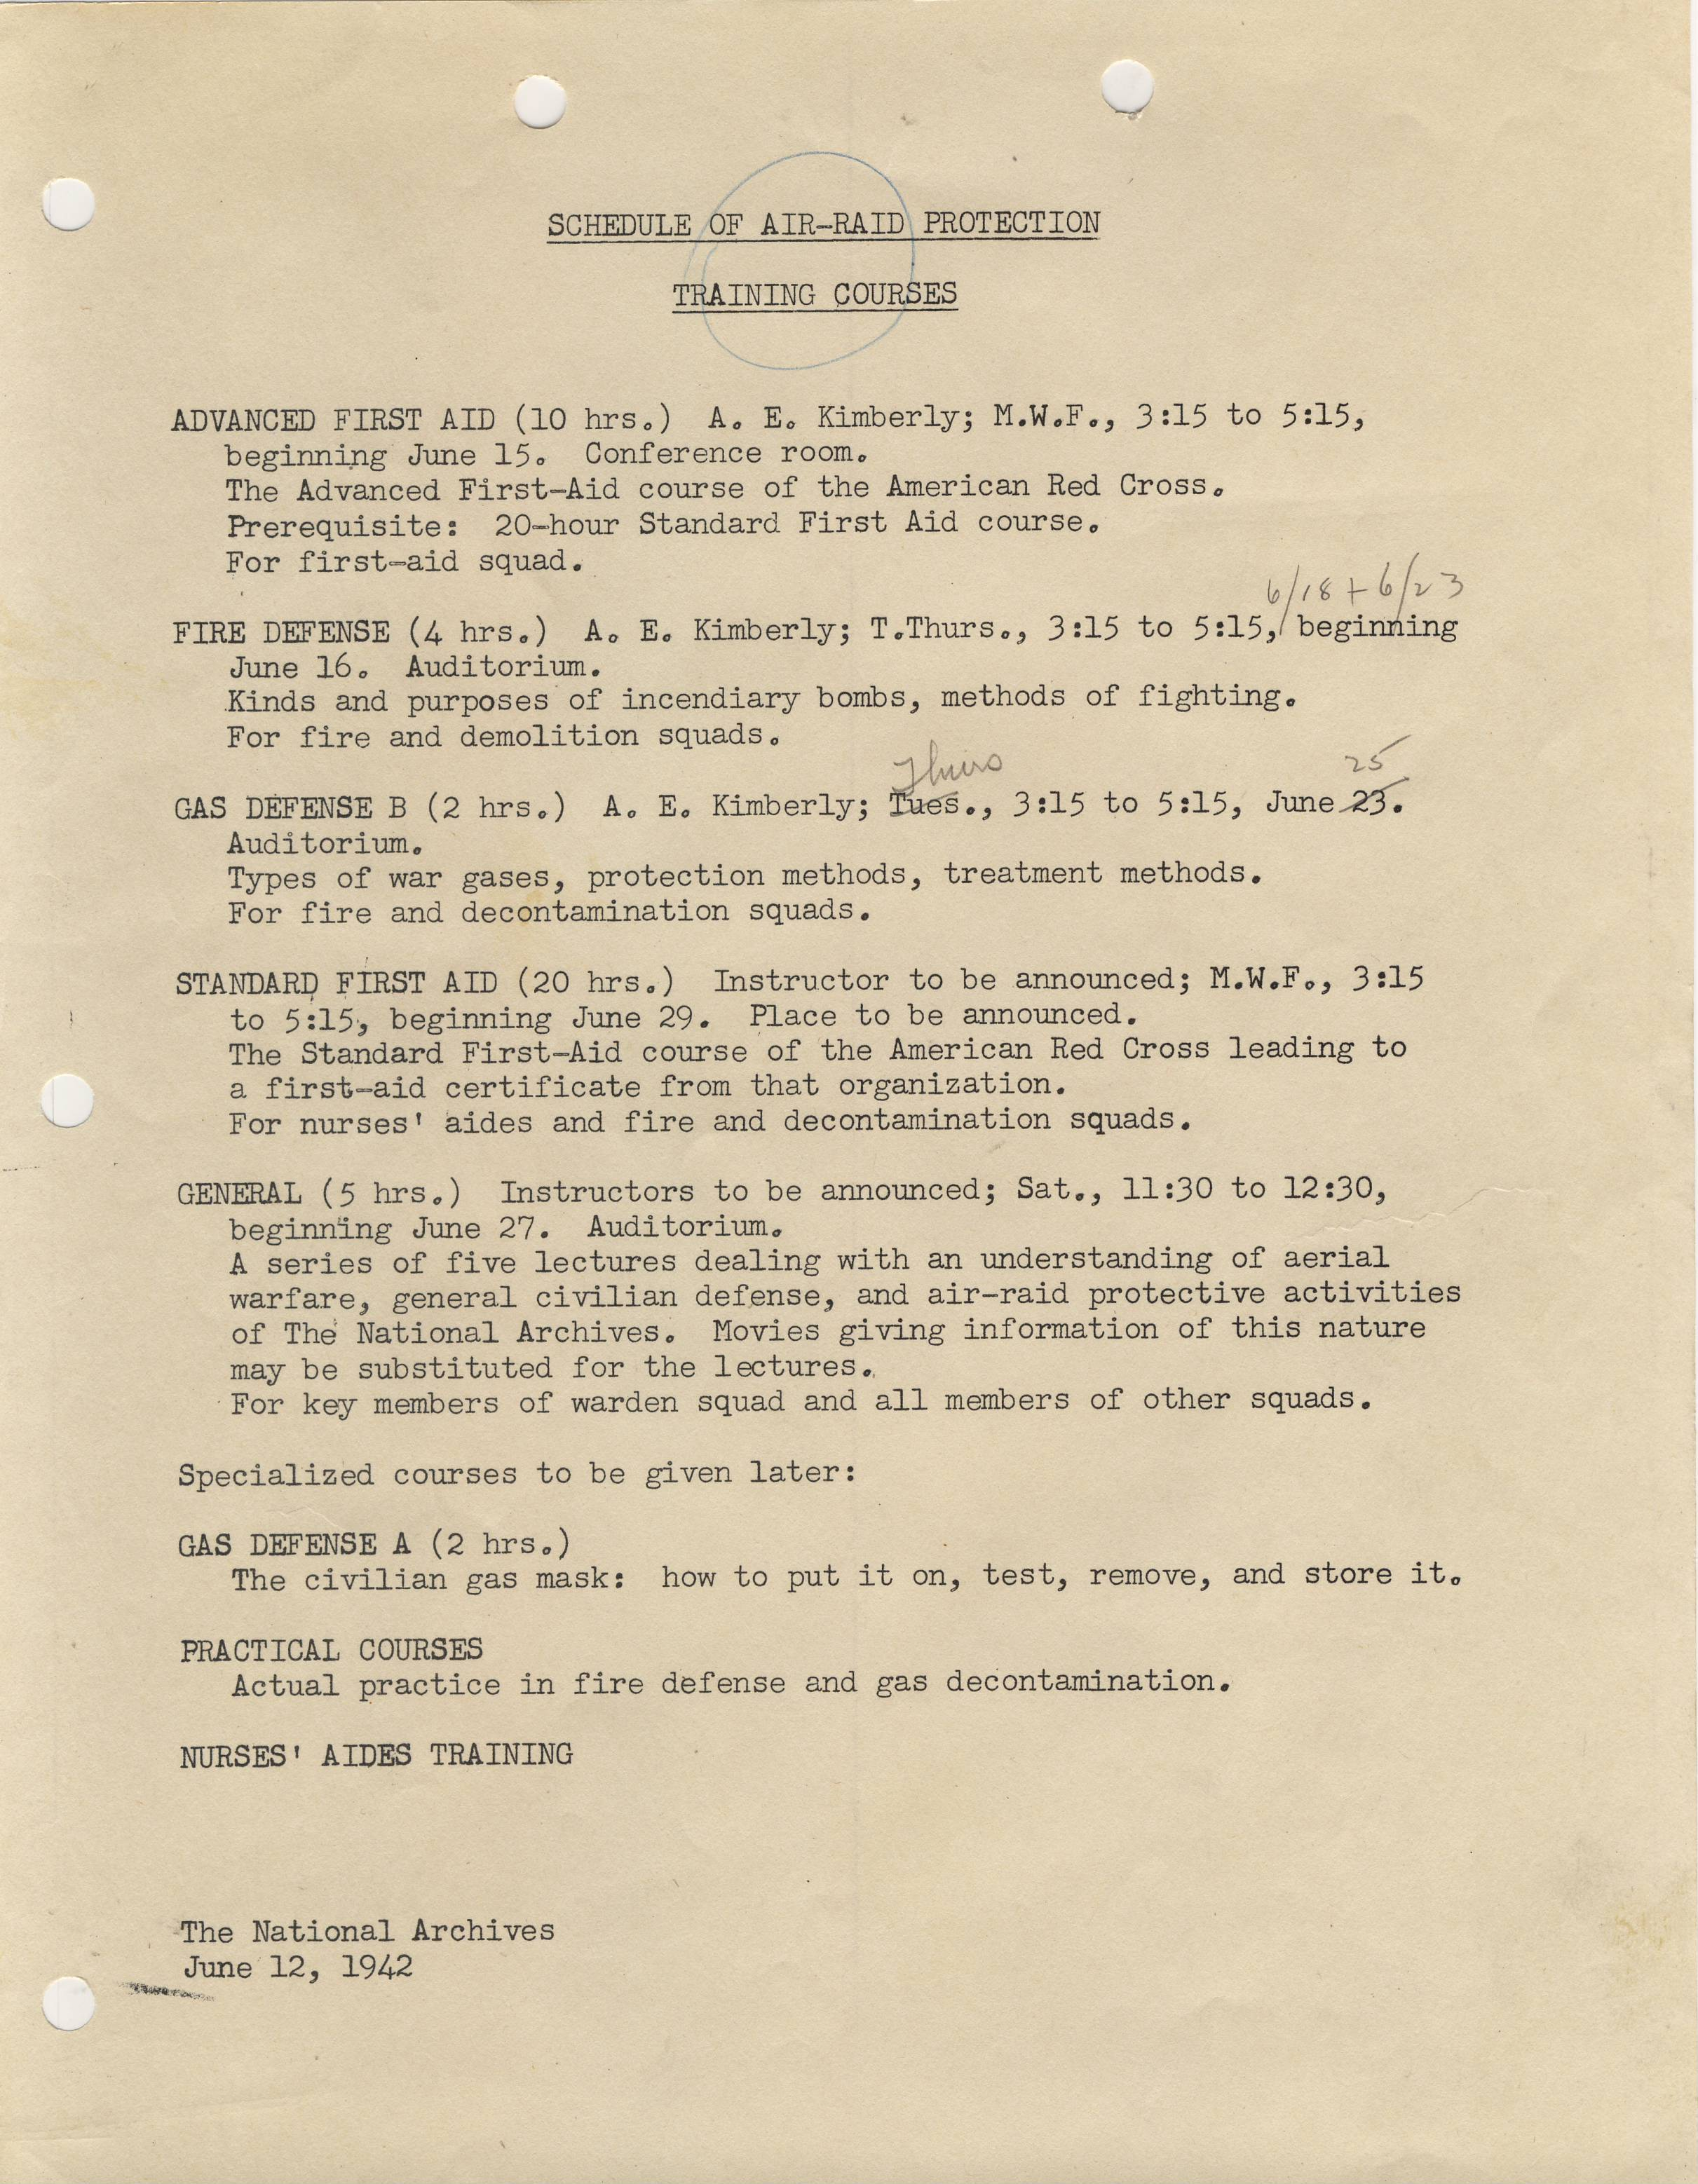 RG 64, A1 49, box 9 folder Training - Schedule of Air-Raid Protection Training Courses